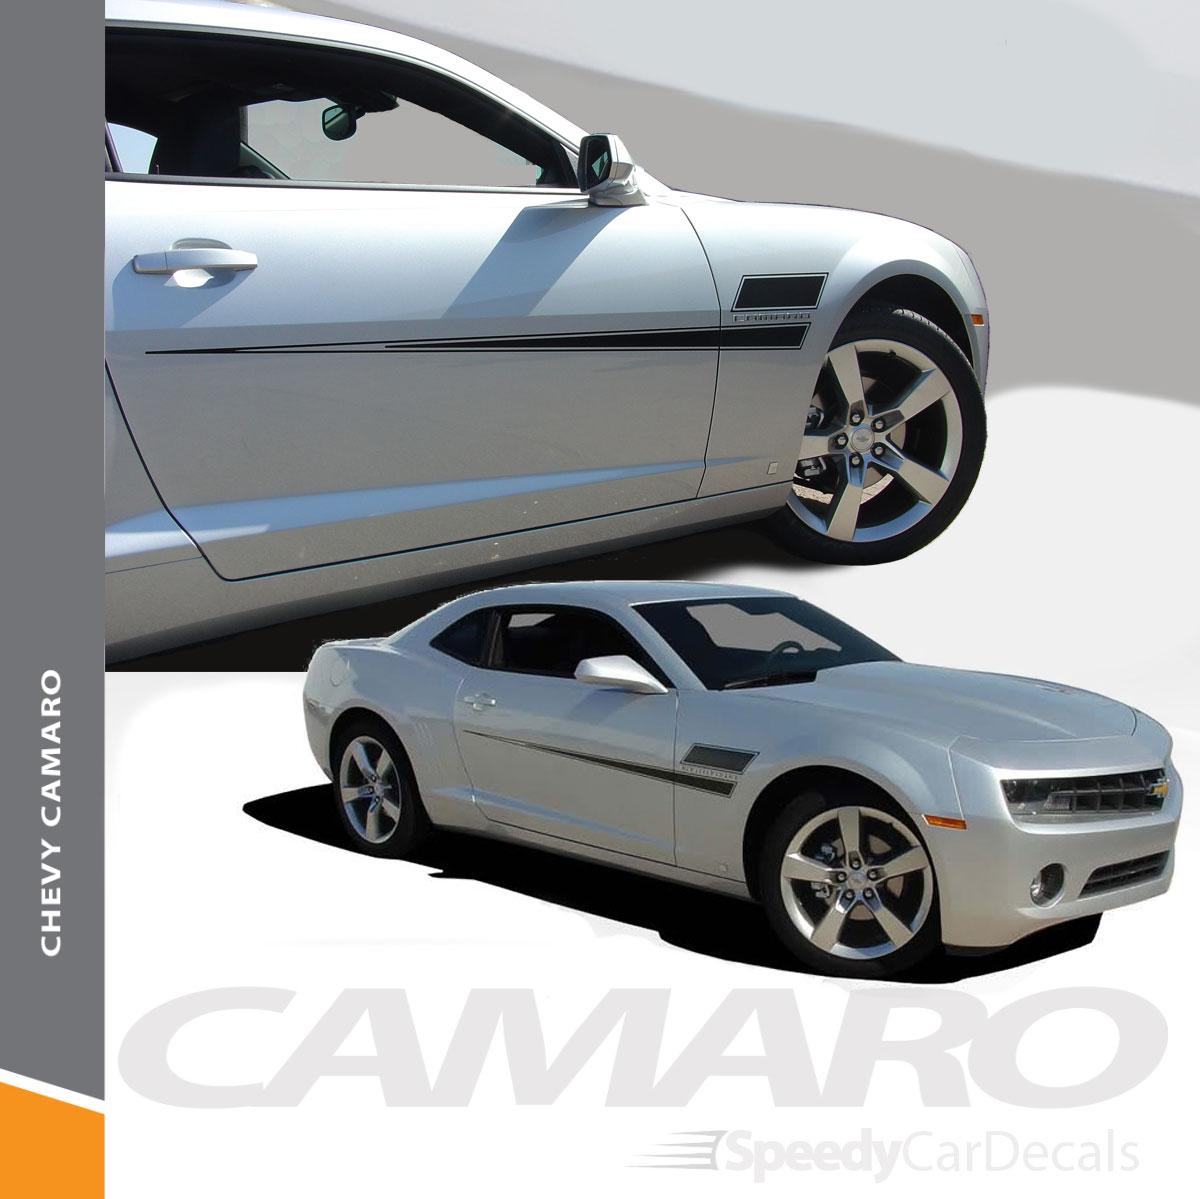 Speed Side 3M Pro Vinyl Stripes Graphics Decals 2010 2011 2012 2013 SS RS Camaro